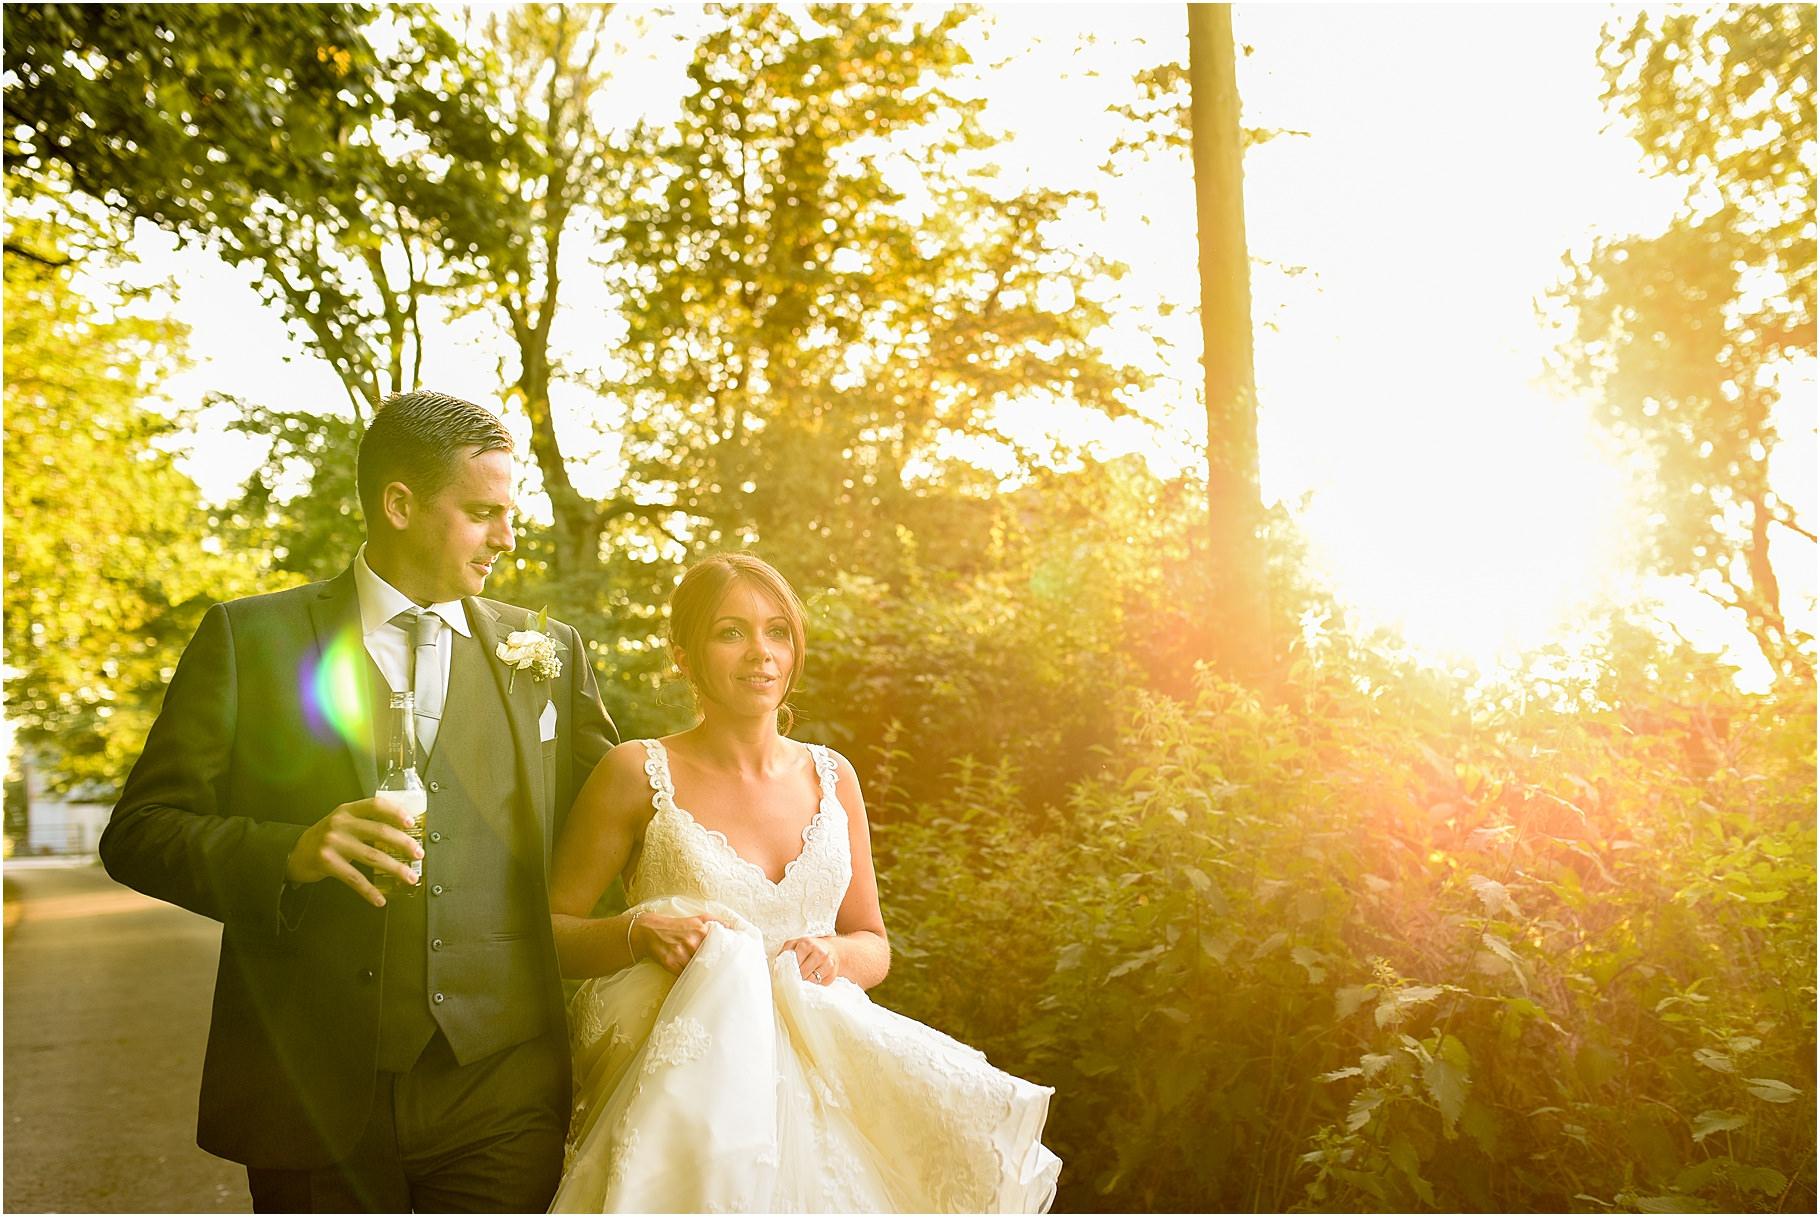 the-villa-wrea-green-wedding-photographer-70.jpg